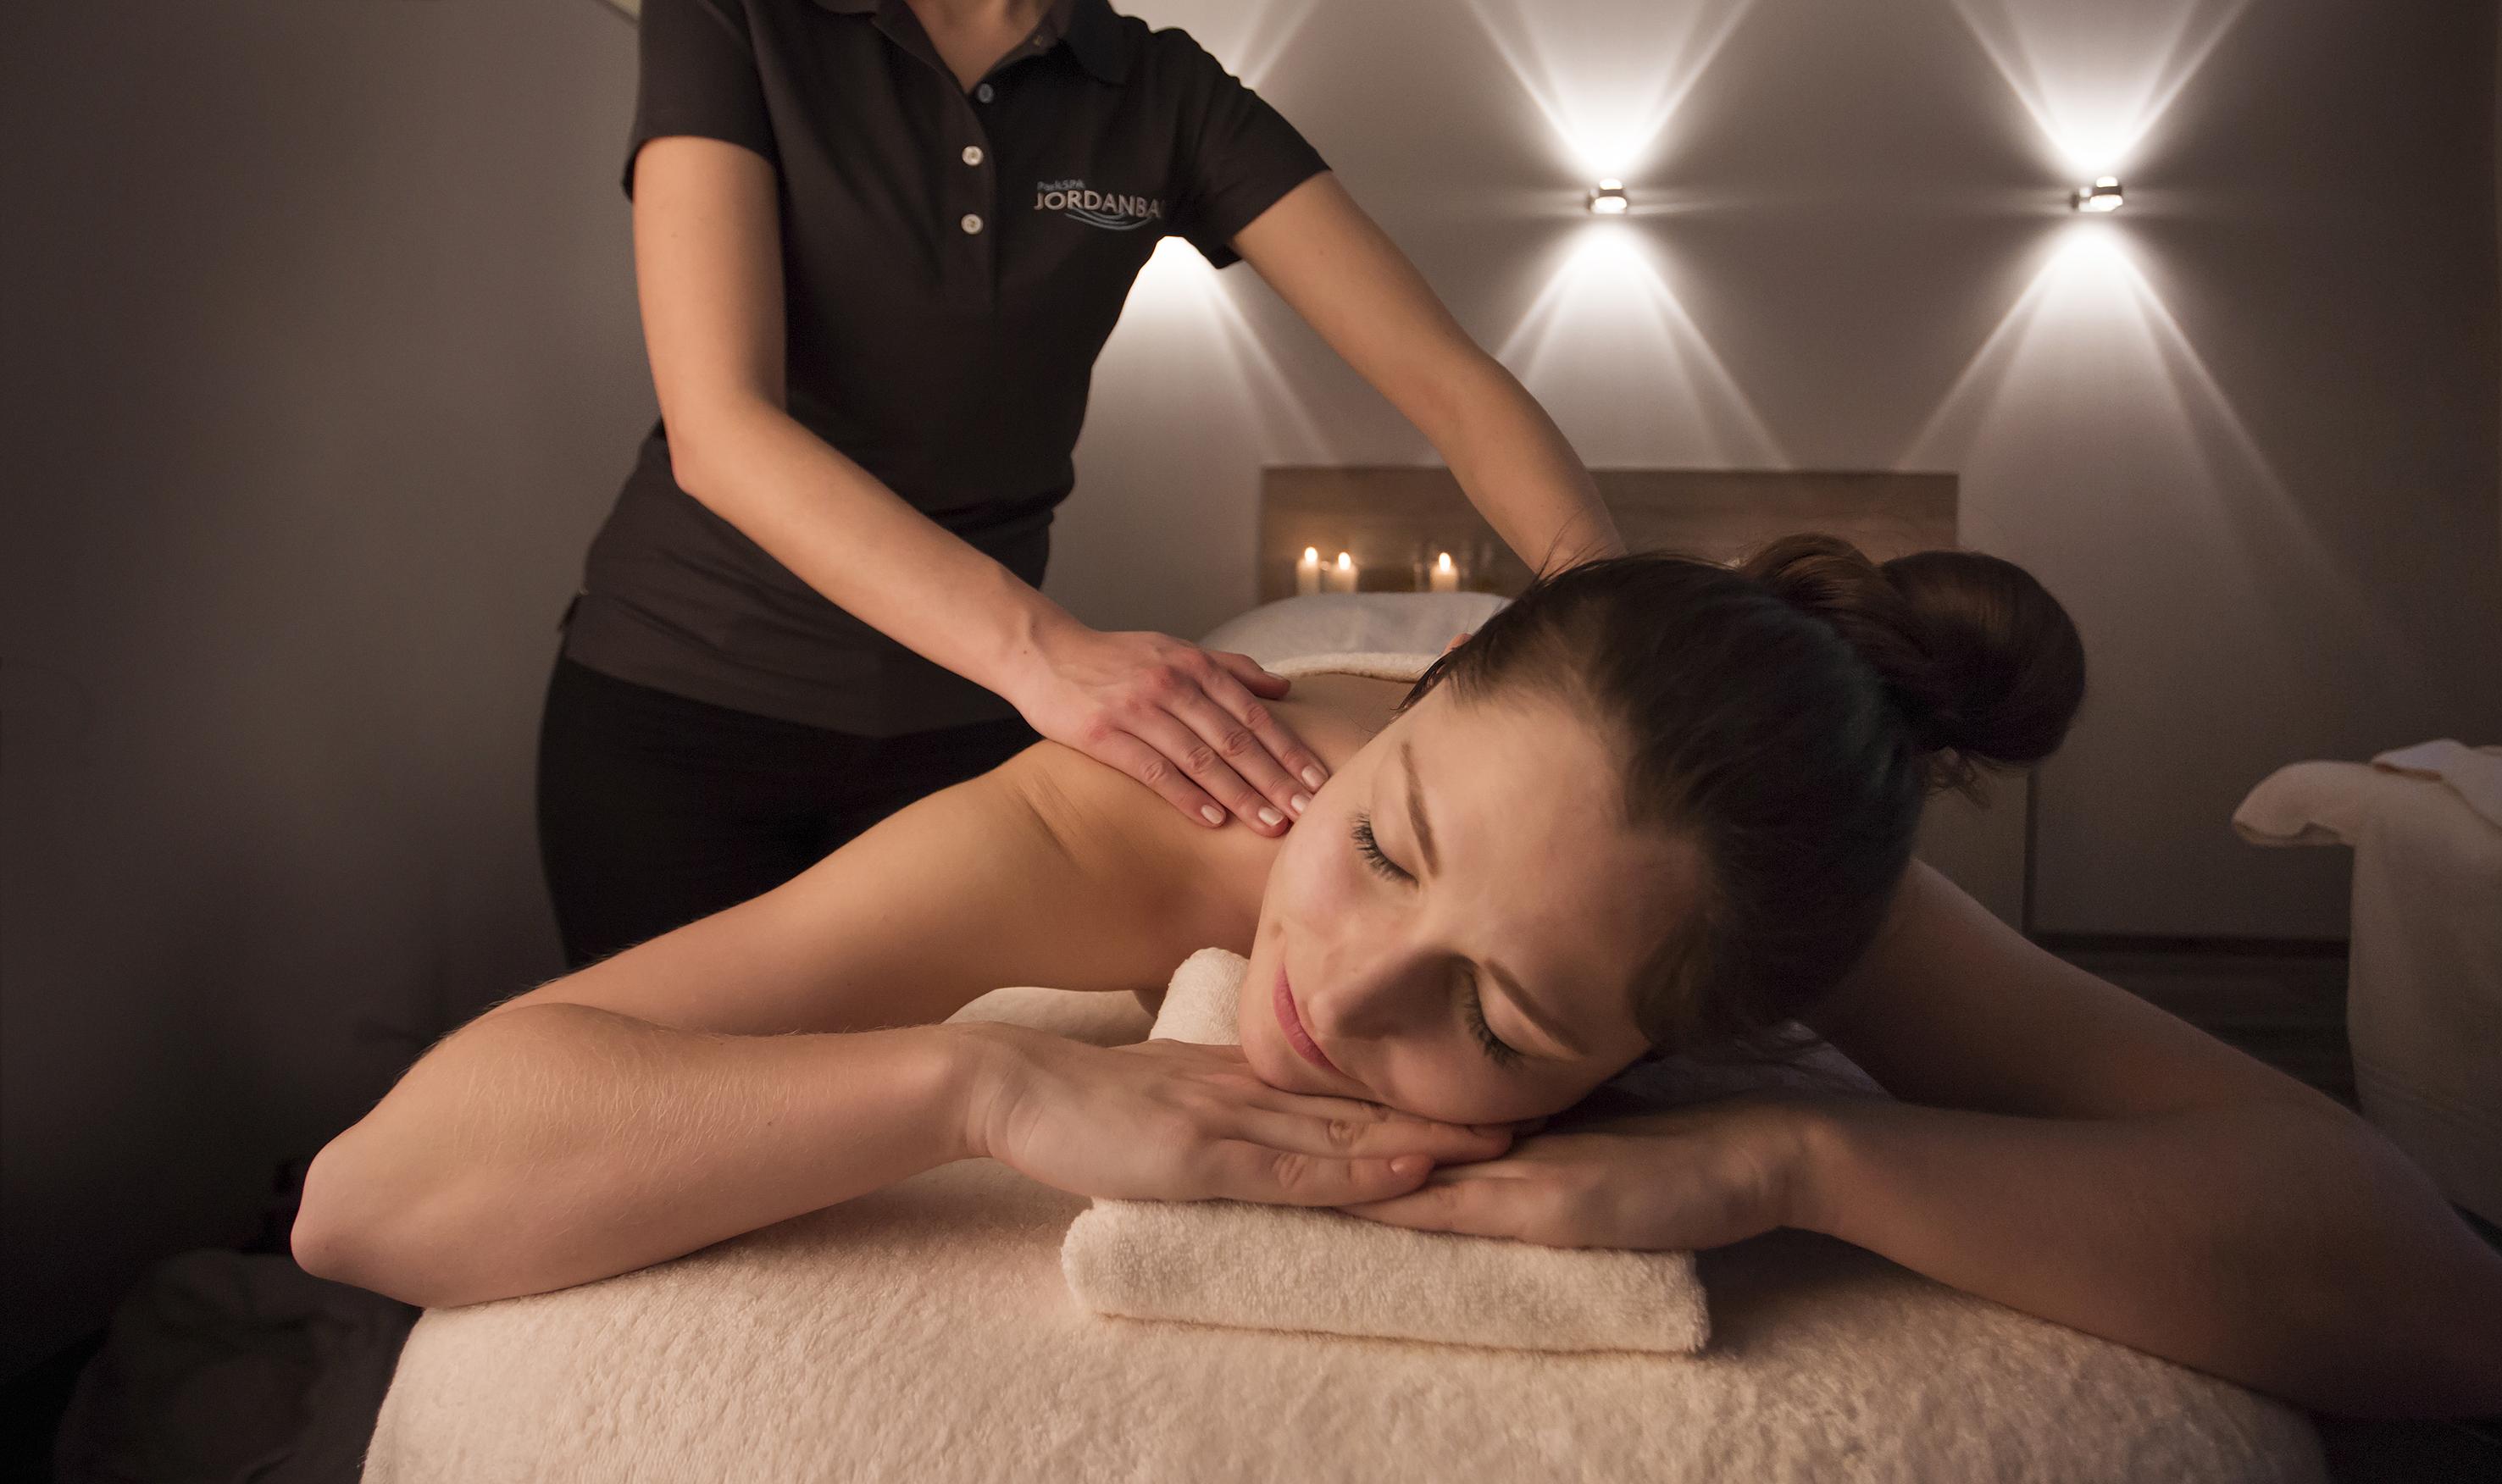 Parkhotel Jordanbad, Park SPA Massage